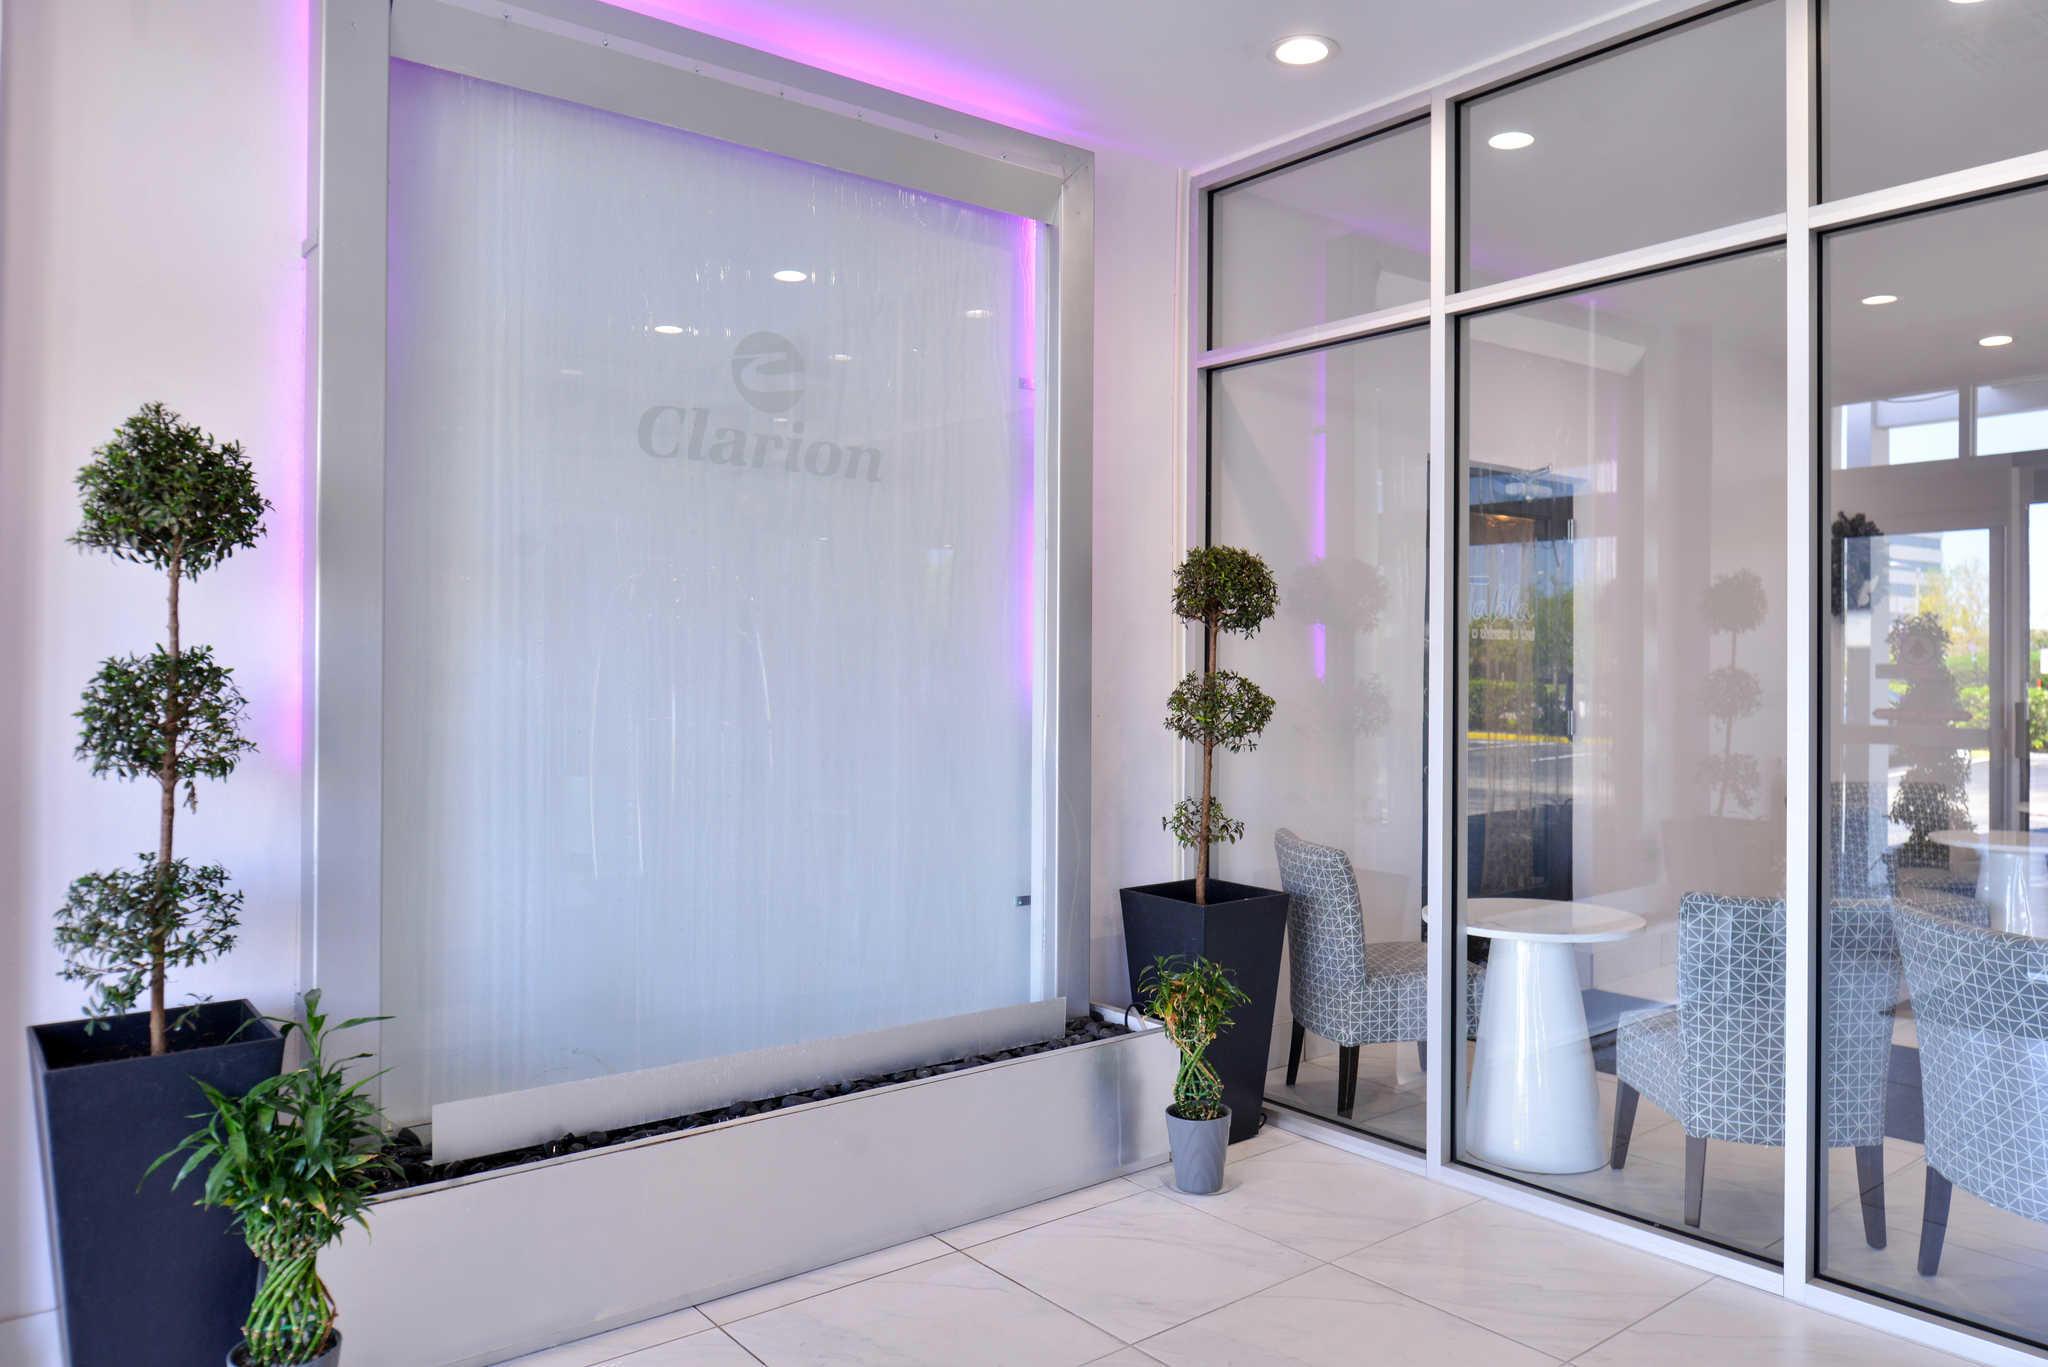 Clarion Inn & Suites Orlando near Theme Parks image 3